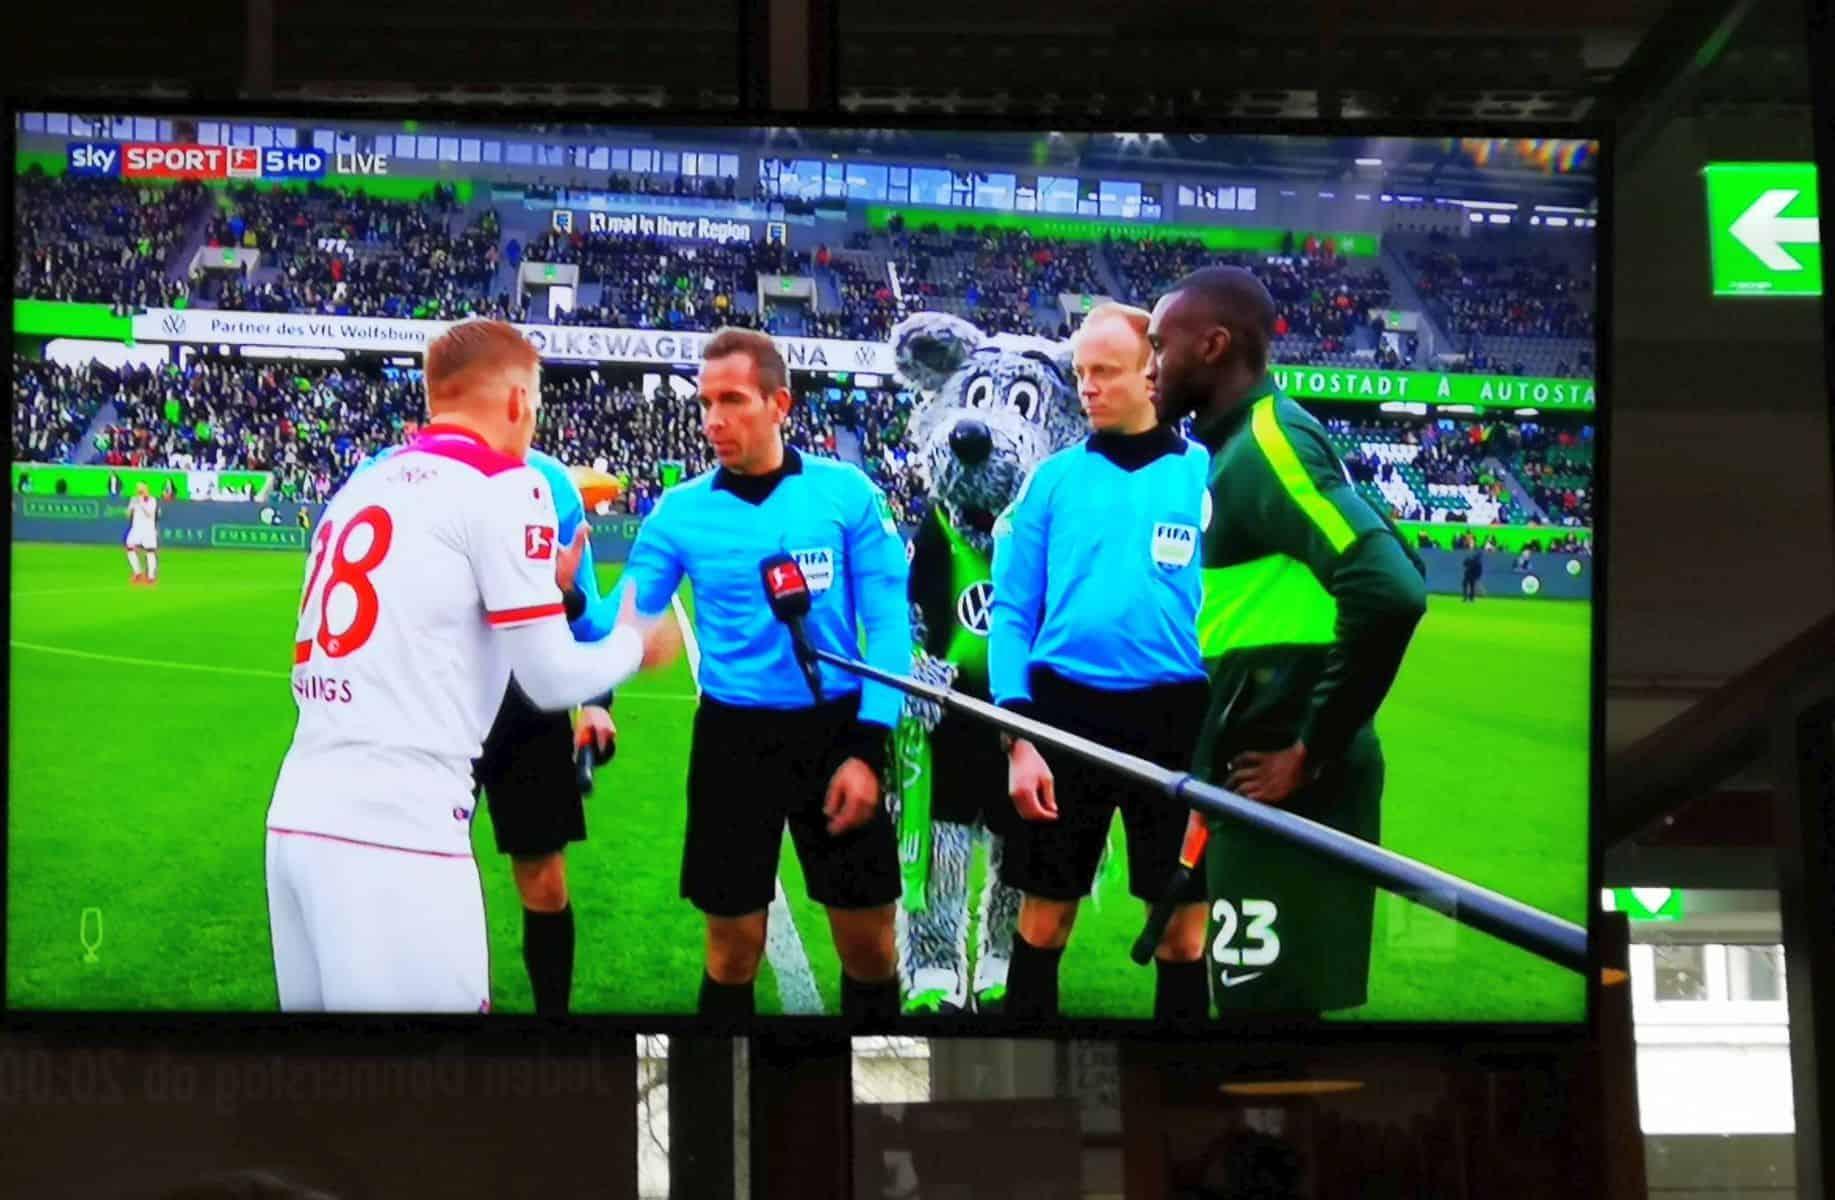 VW-Burg vs F95 - Käpt'n Hennings und die Schiris